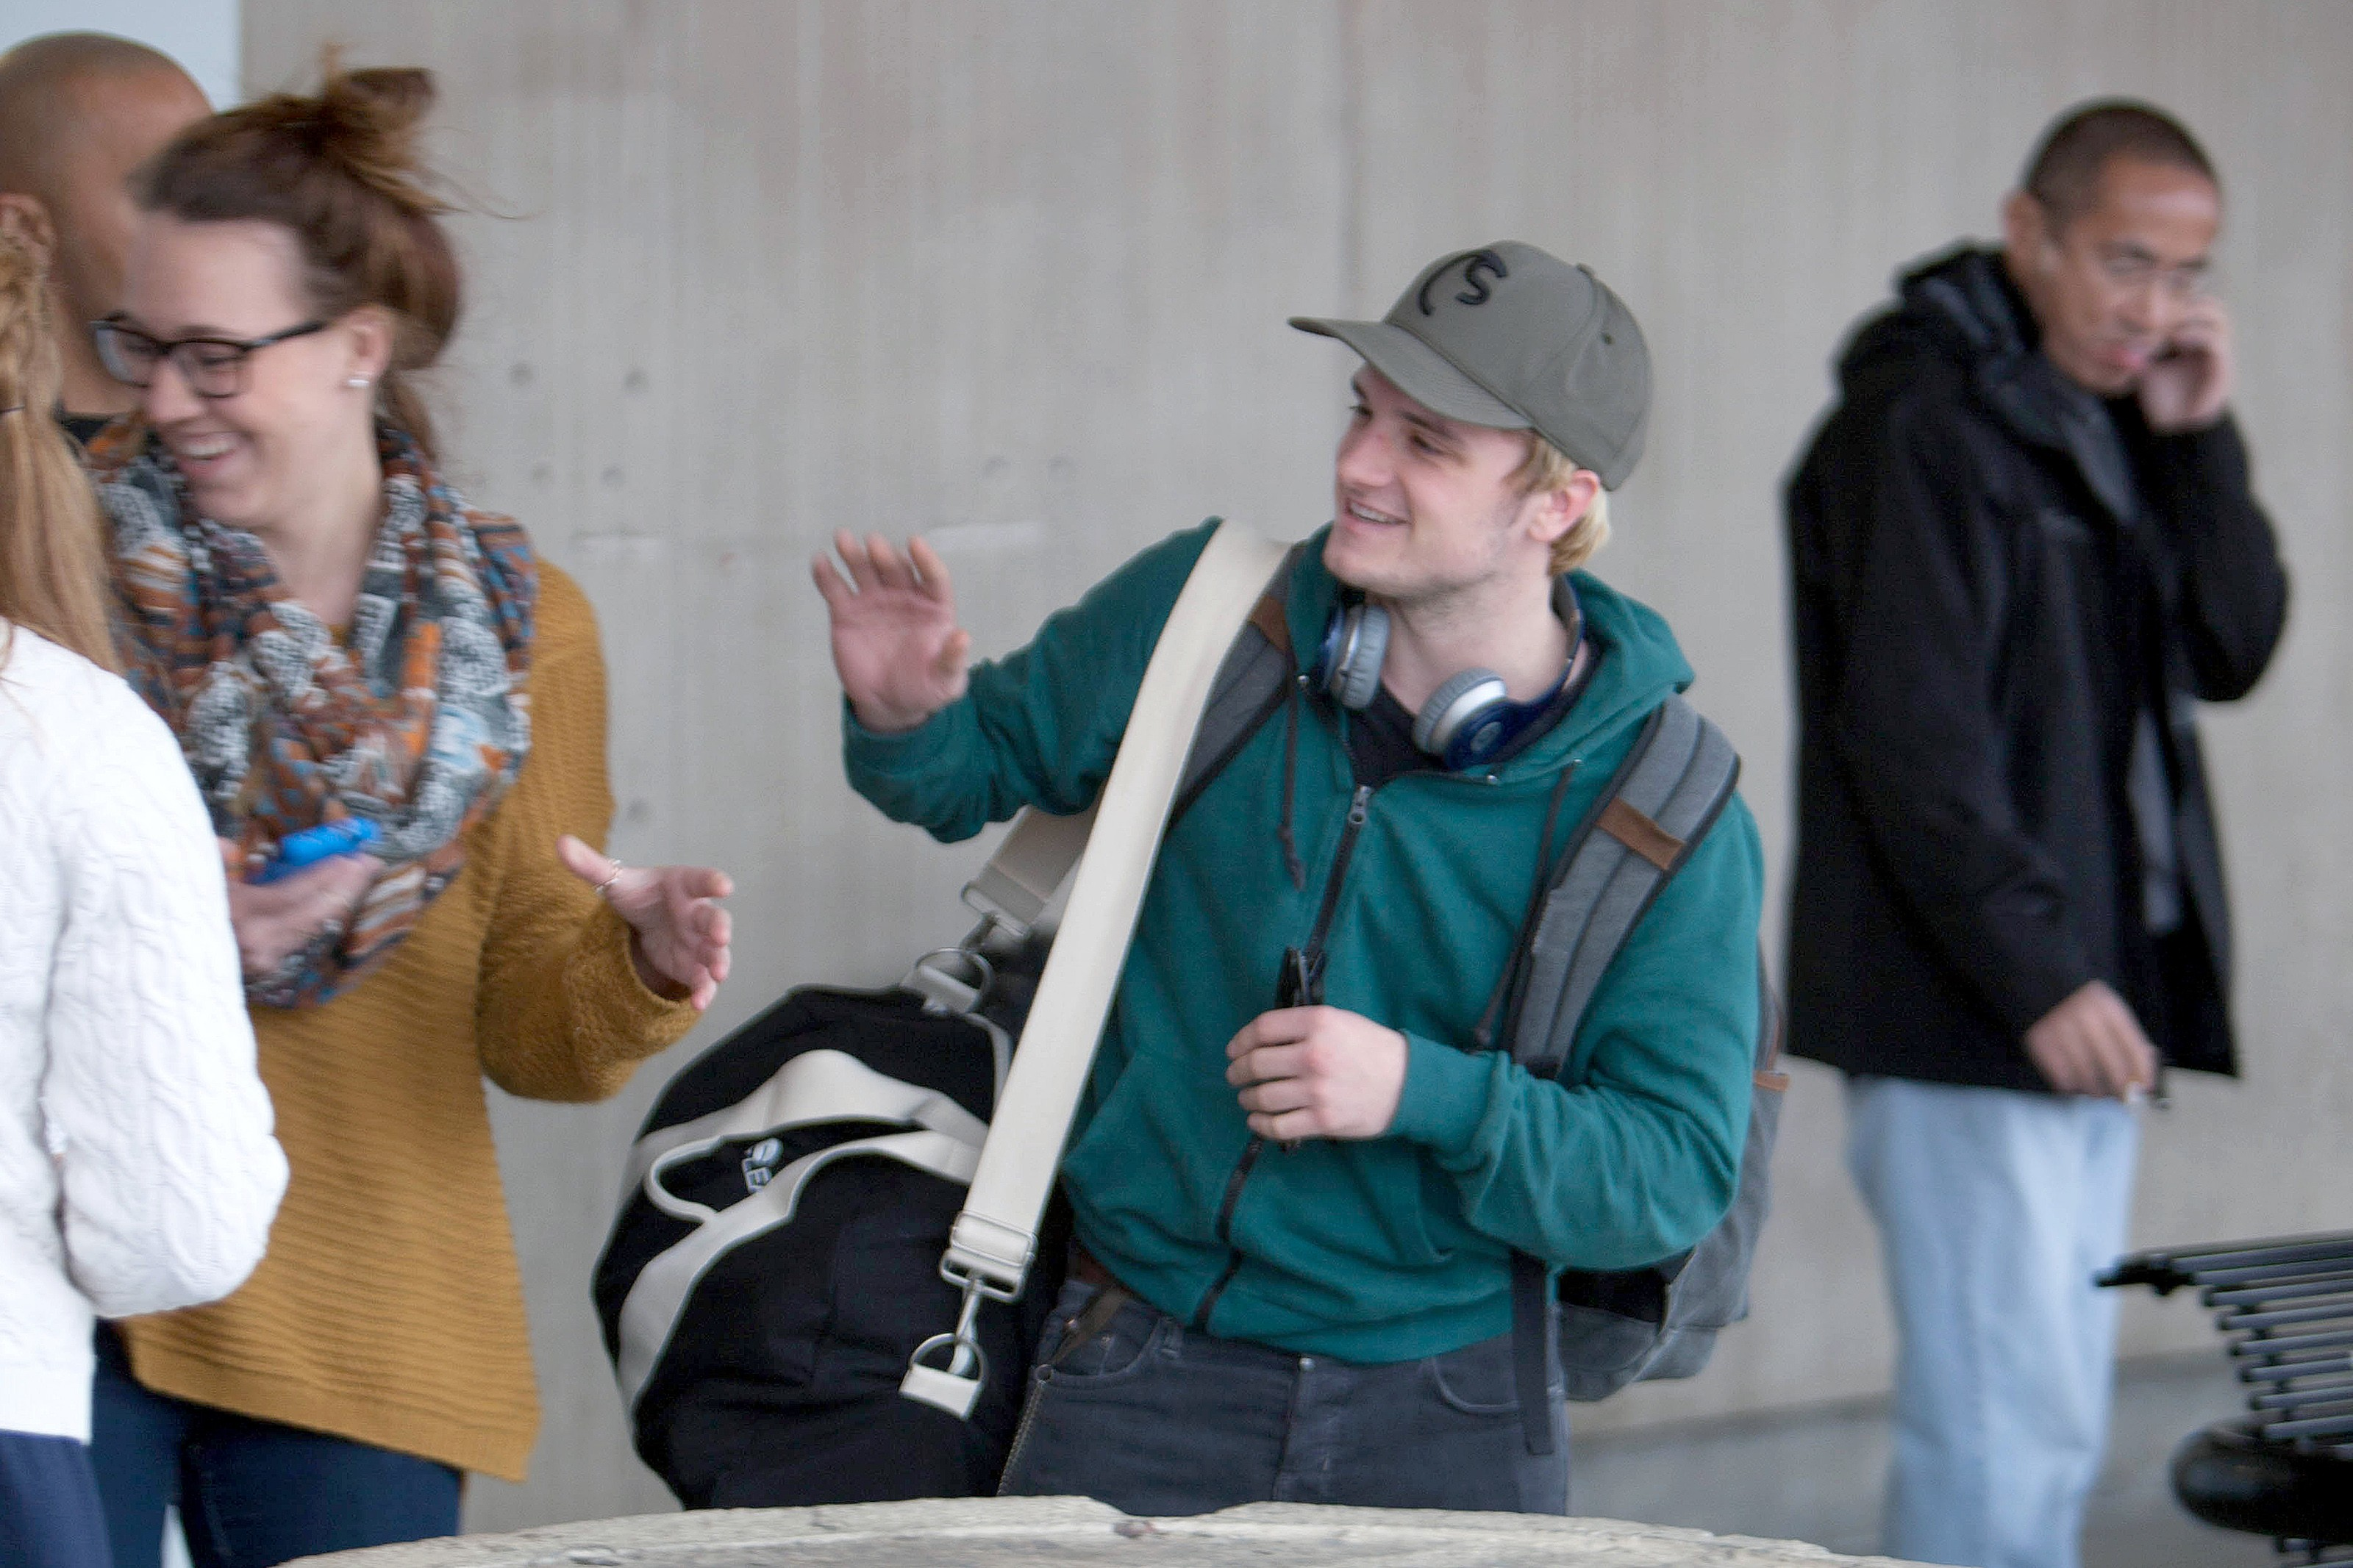 Josh Hutcherson Spotted At Atlanta Airport The Hunger Games News